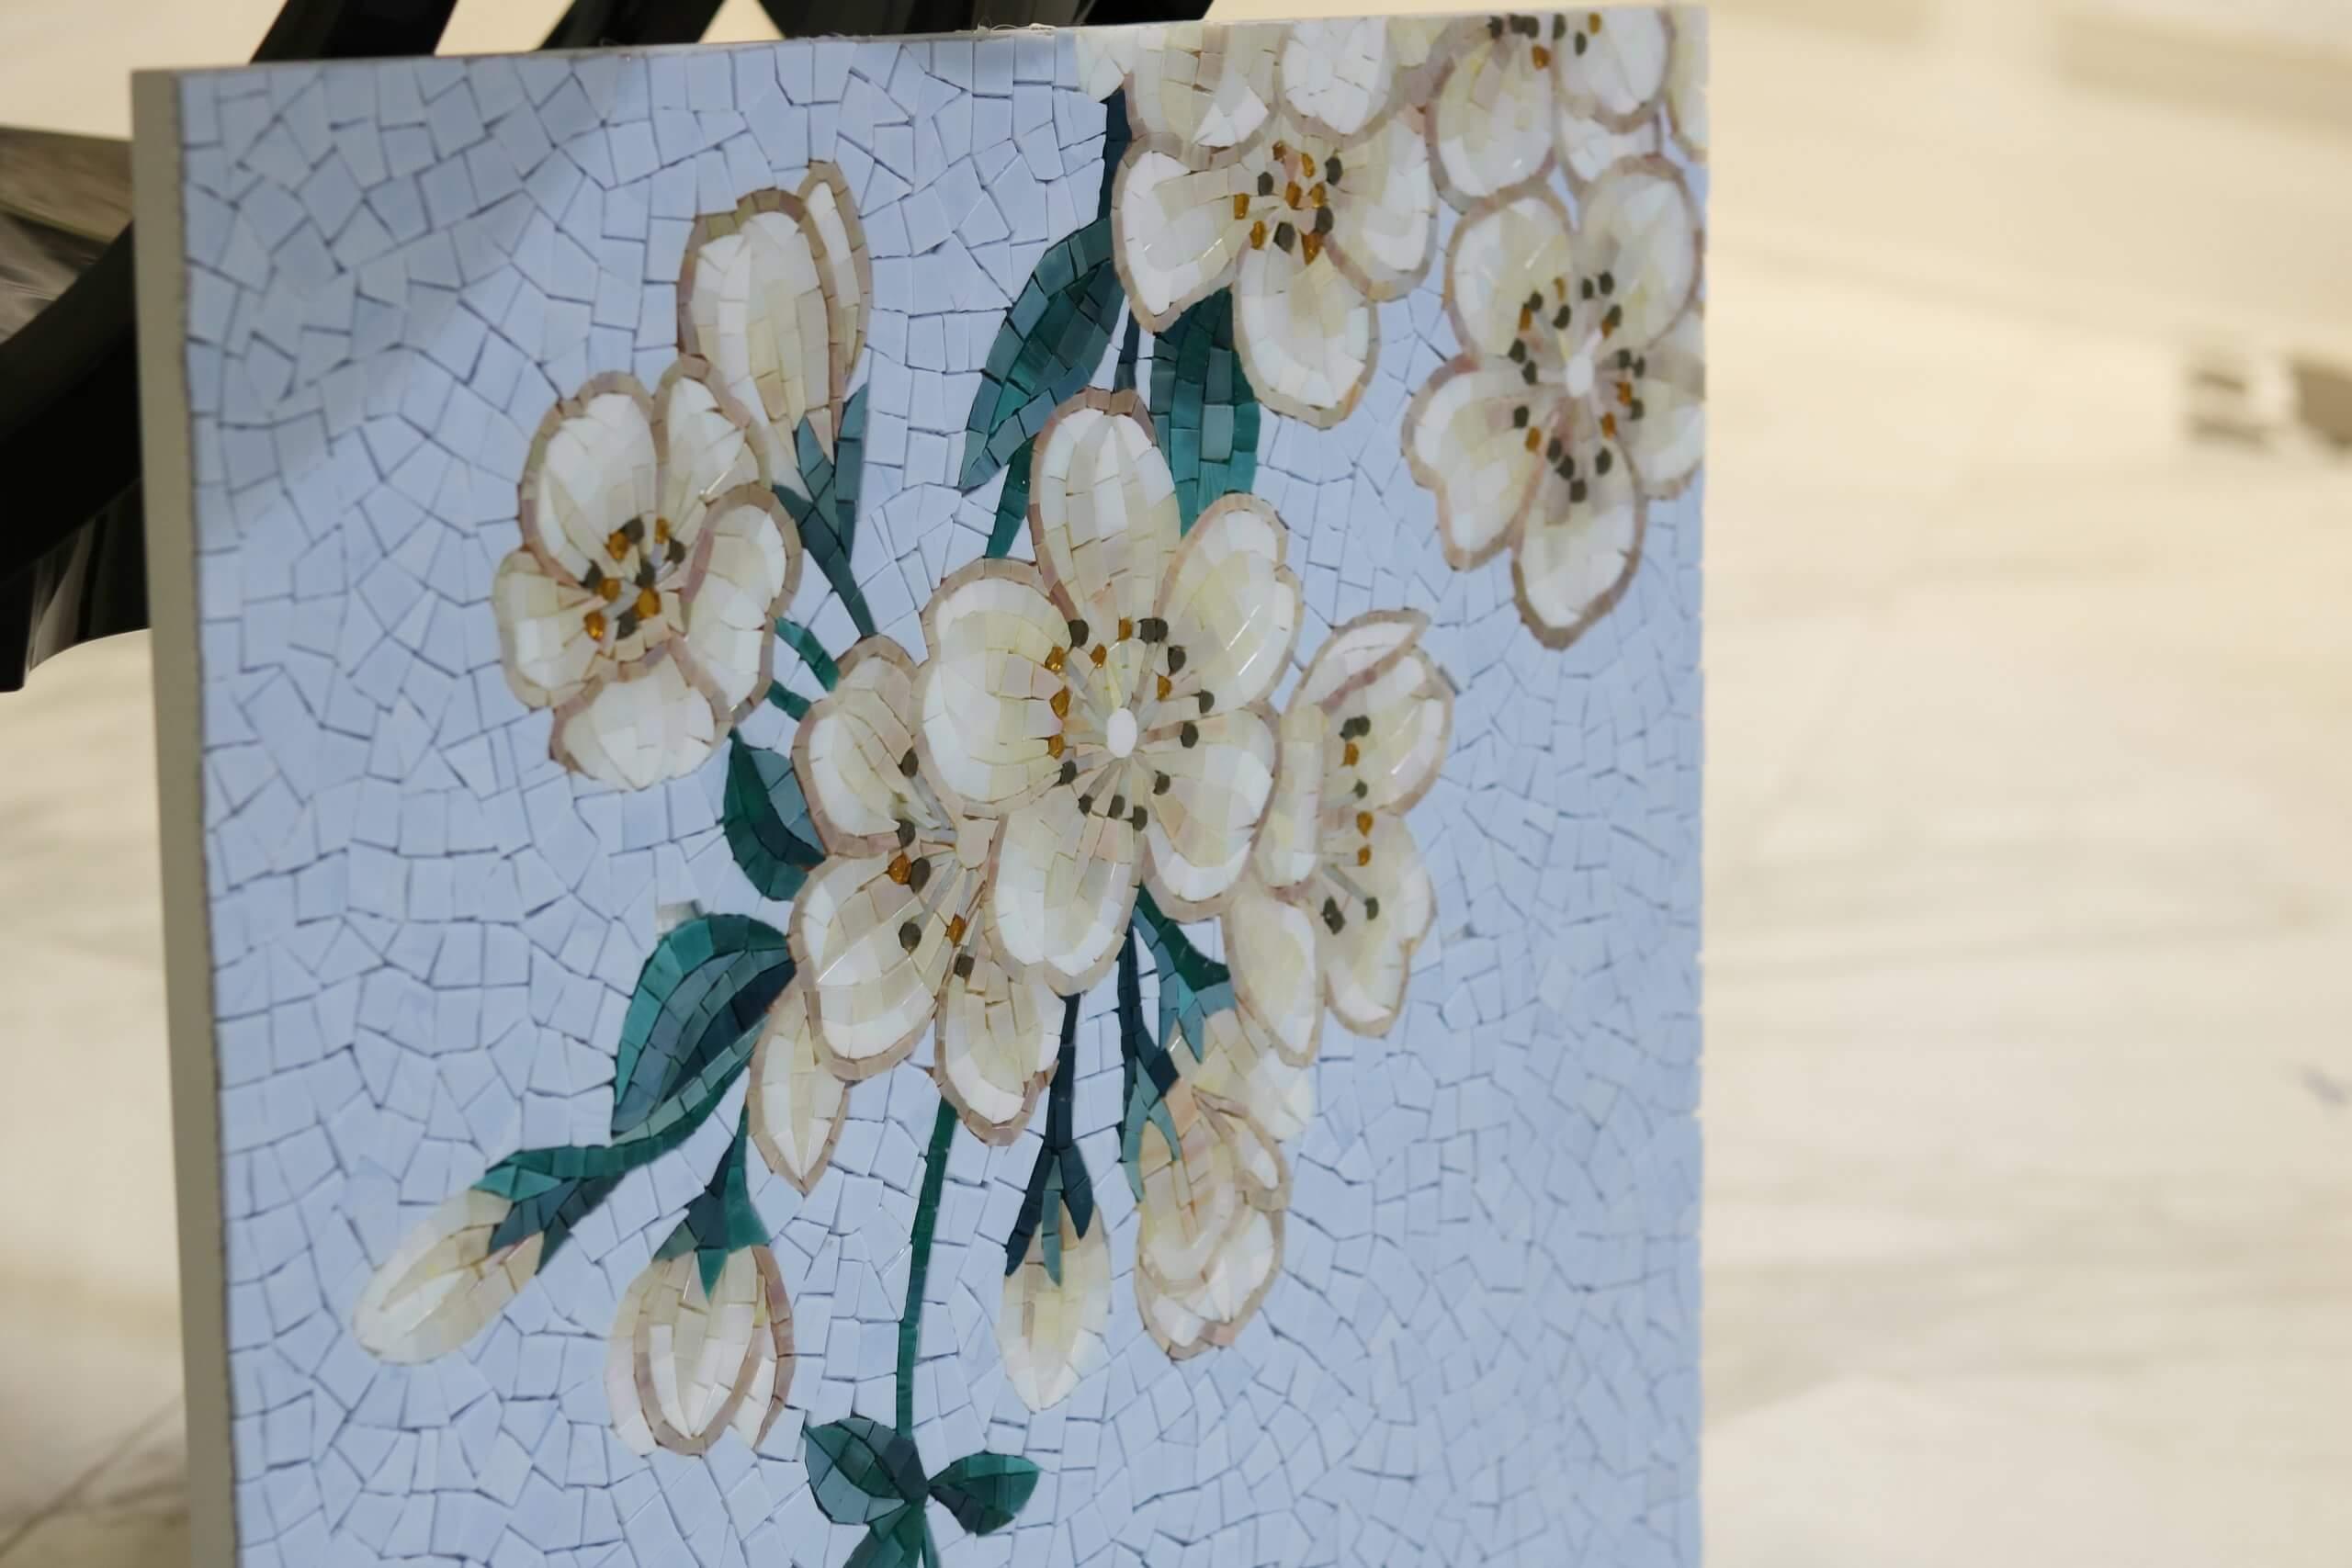 Artistic Mosaic Improve Canada